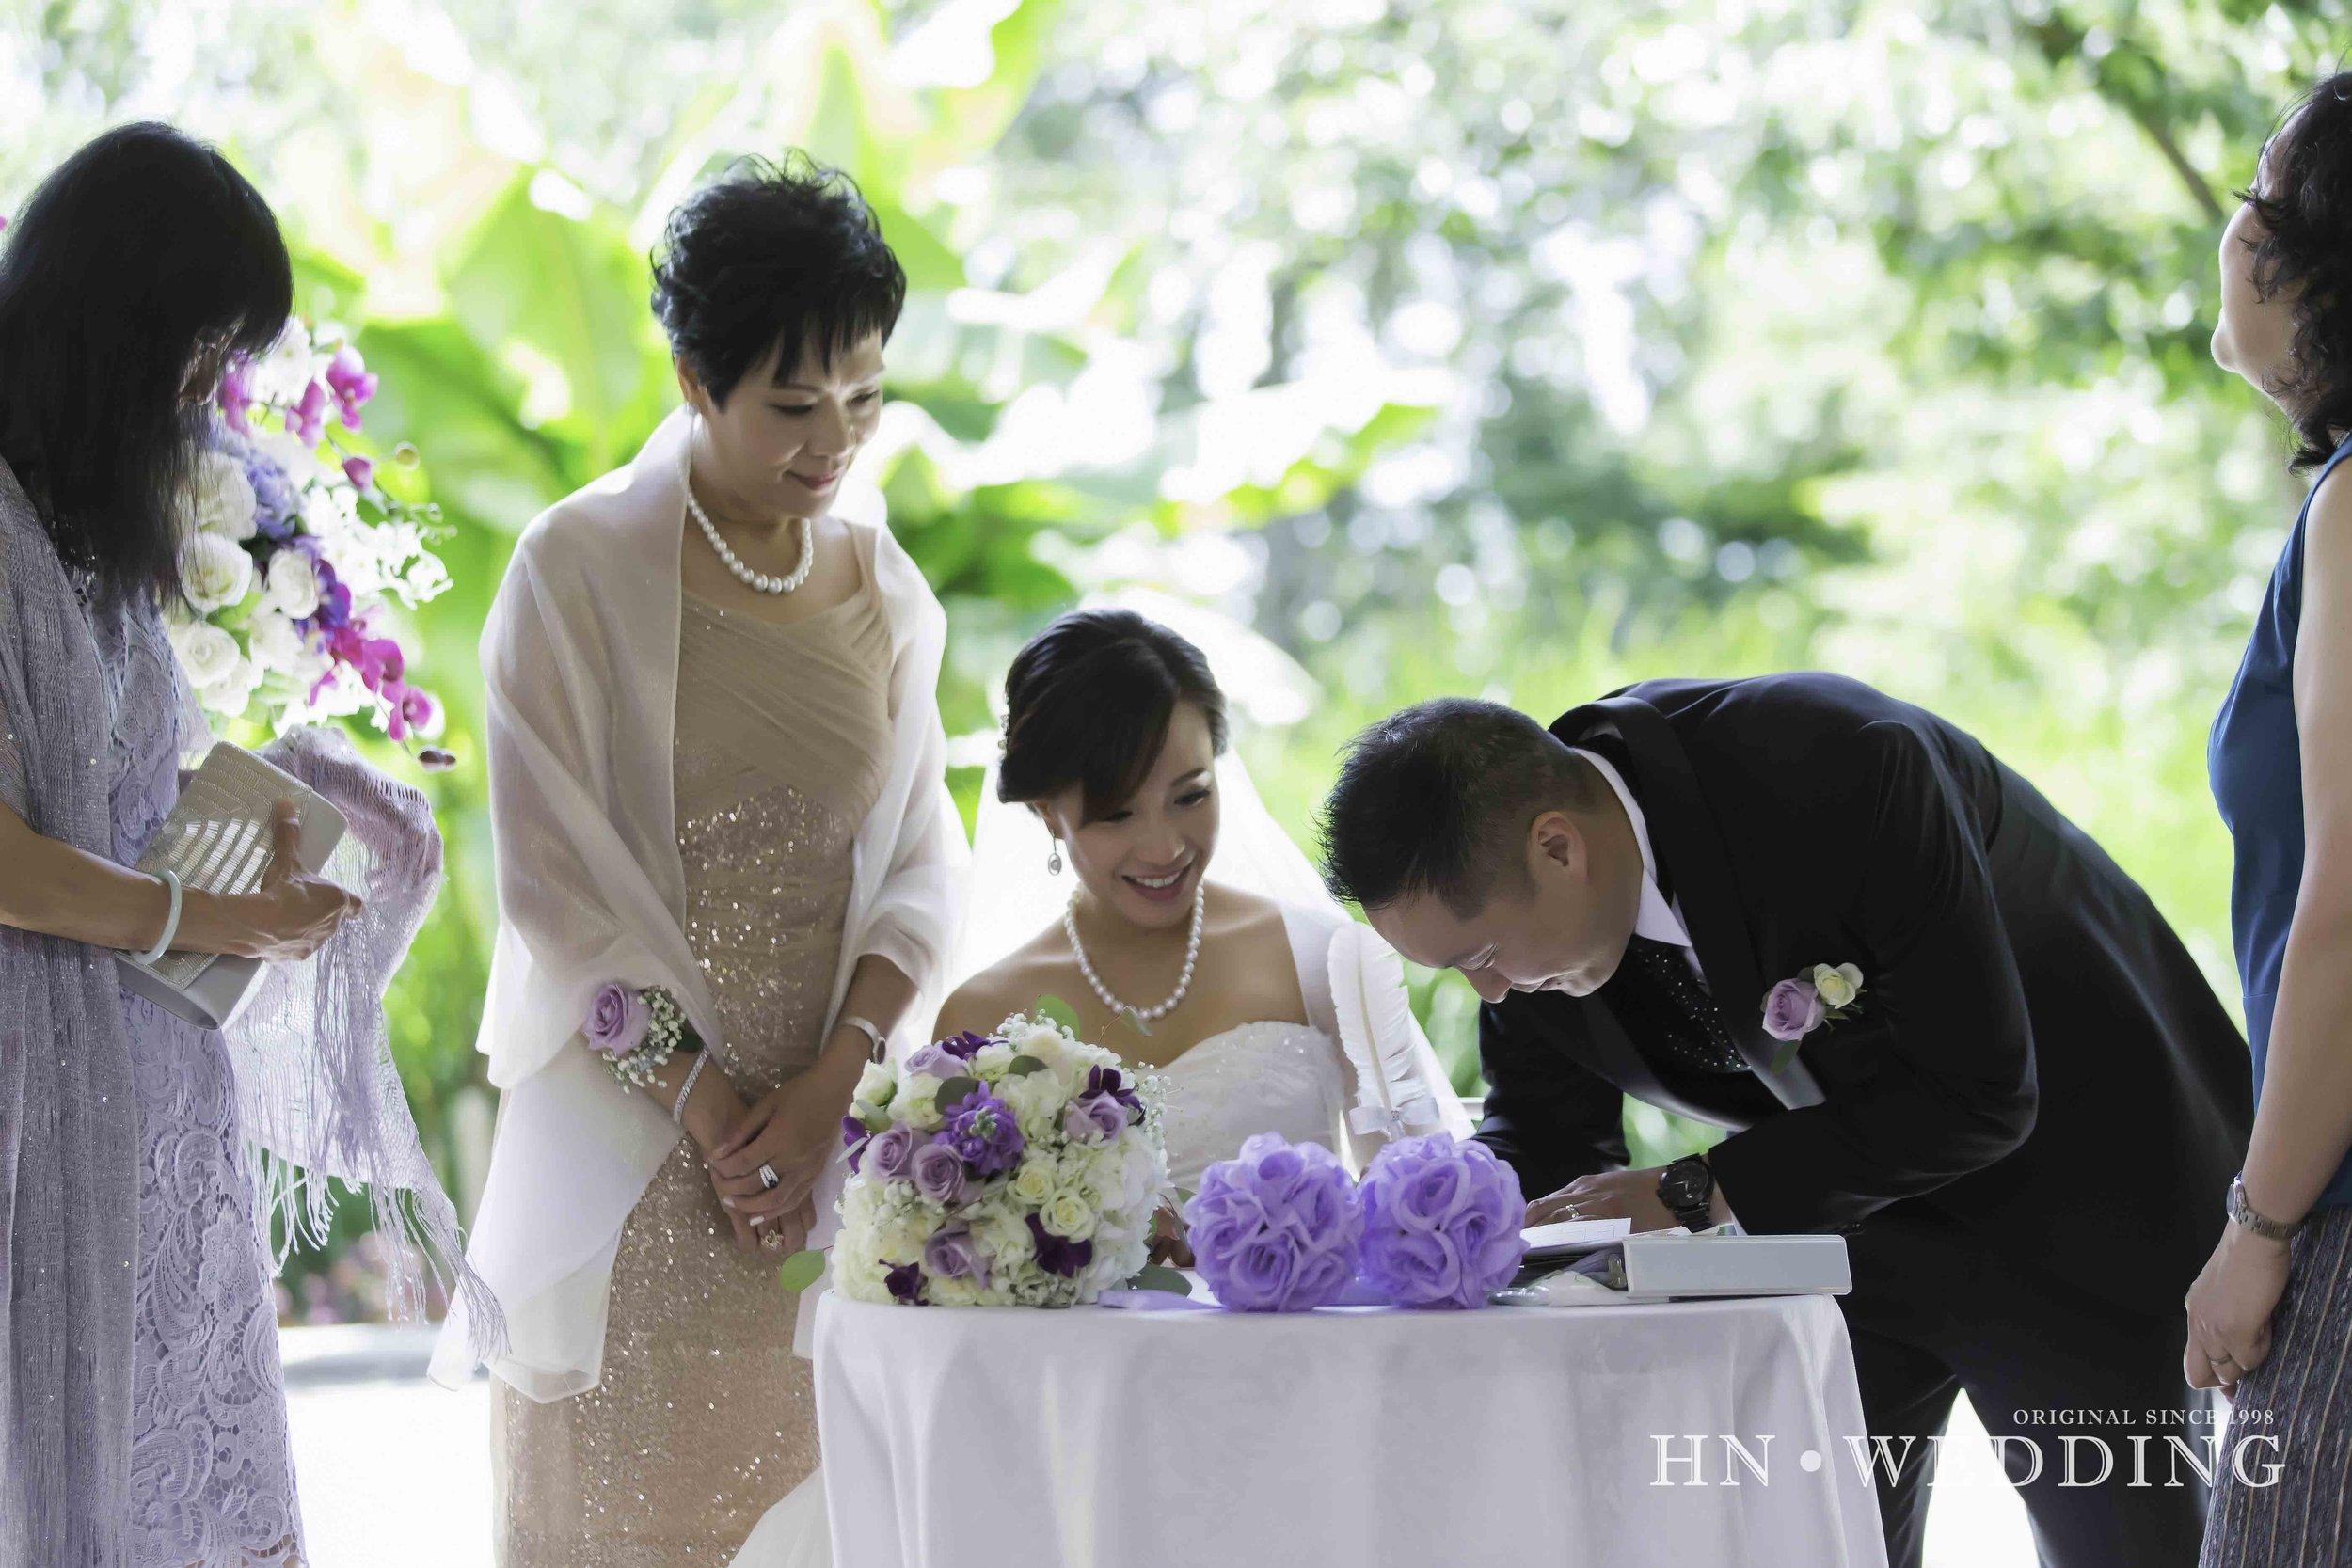 HNwedding-20160822-wedding-6218.jpg